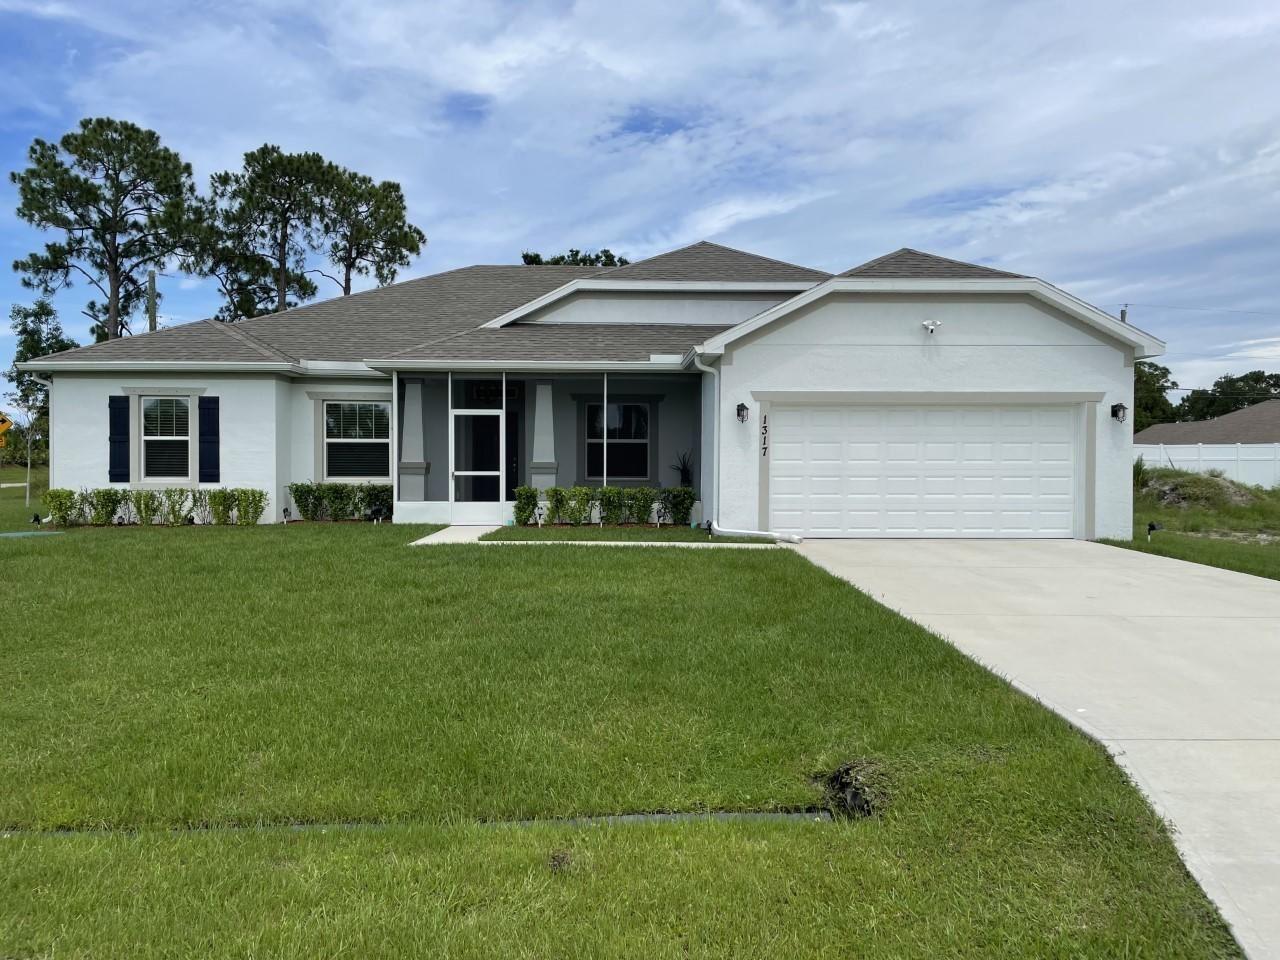 Photo of 1317 SE Odonnell Lane, Saint Lucie West, FL 34983 (MLS # RX-10726523)